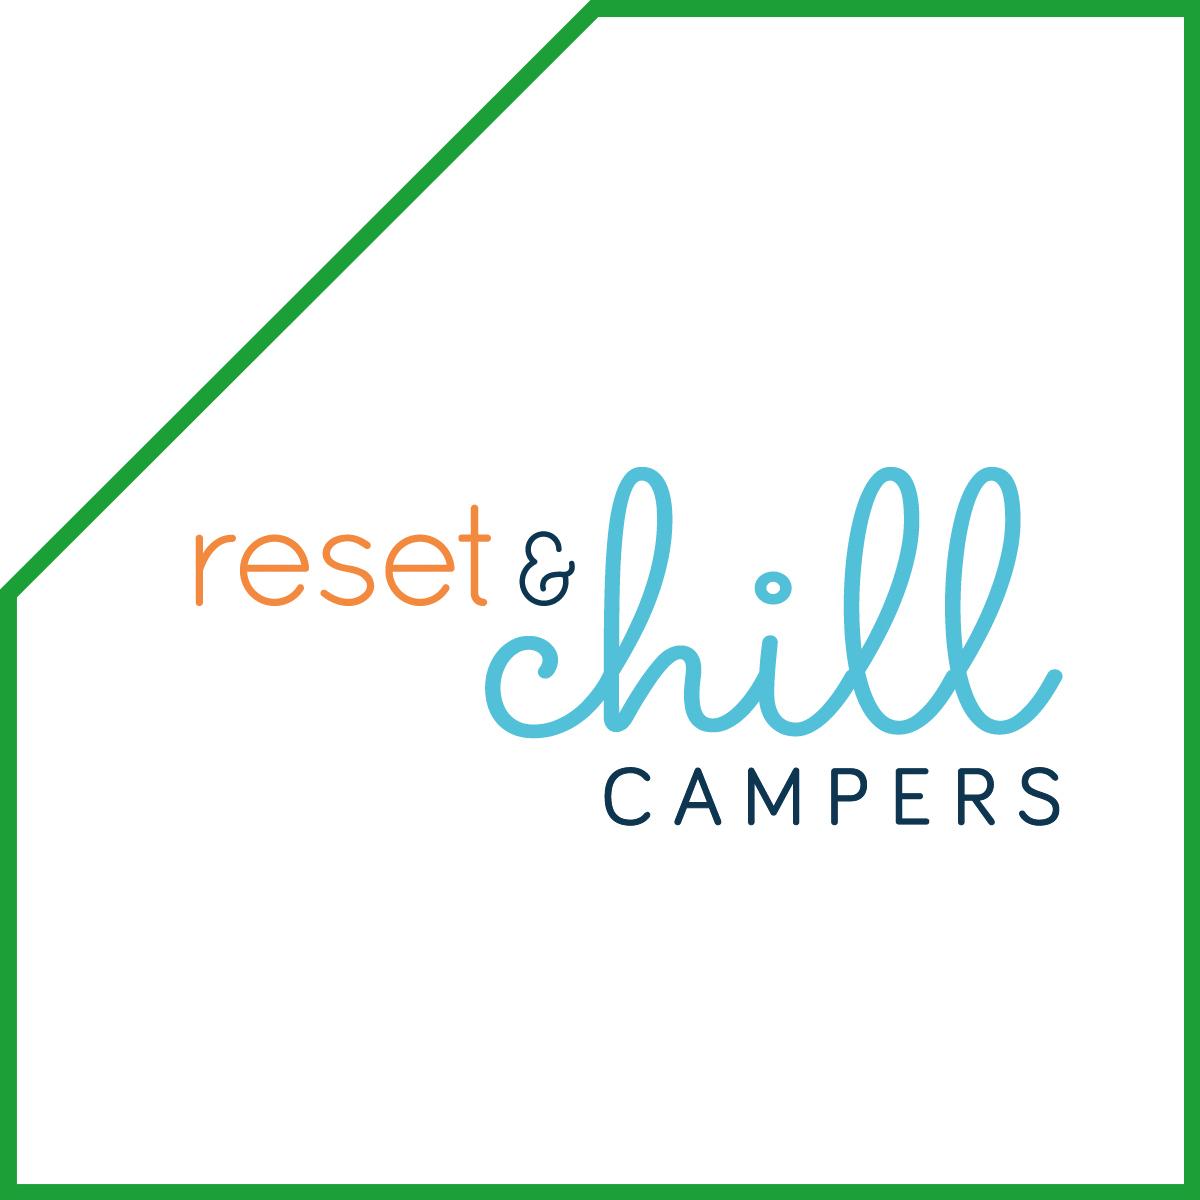 Reset & Chill